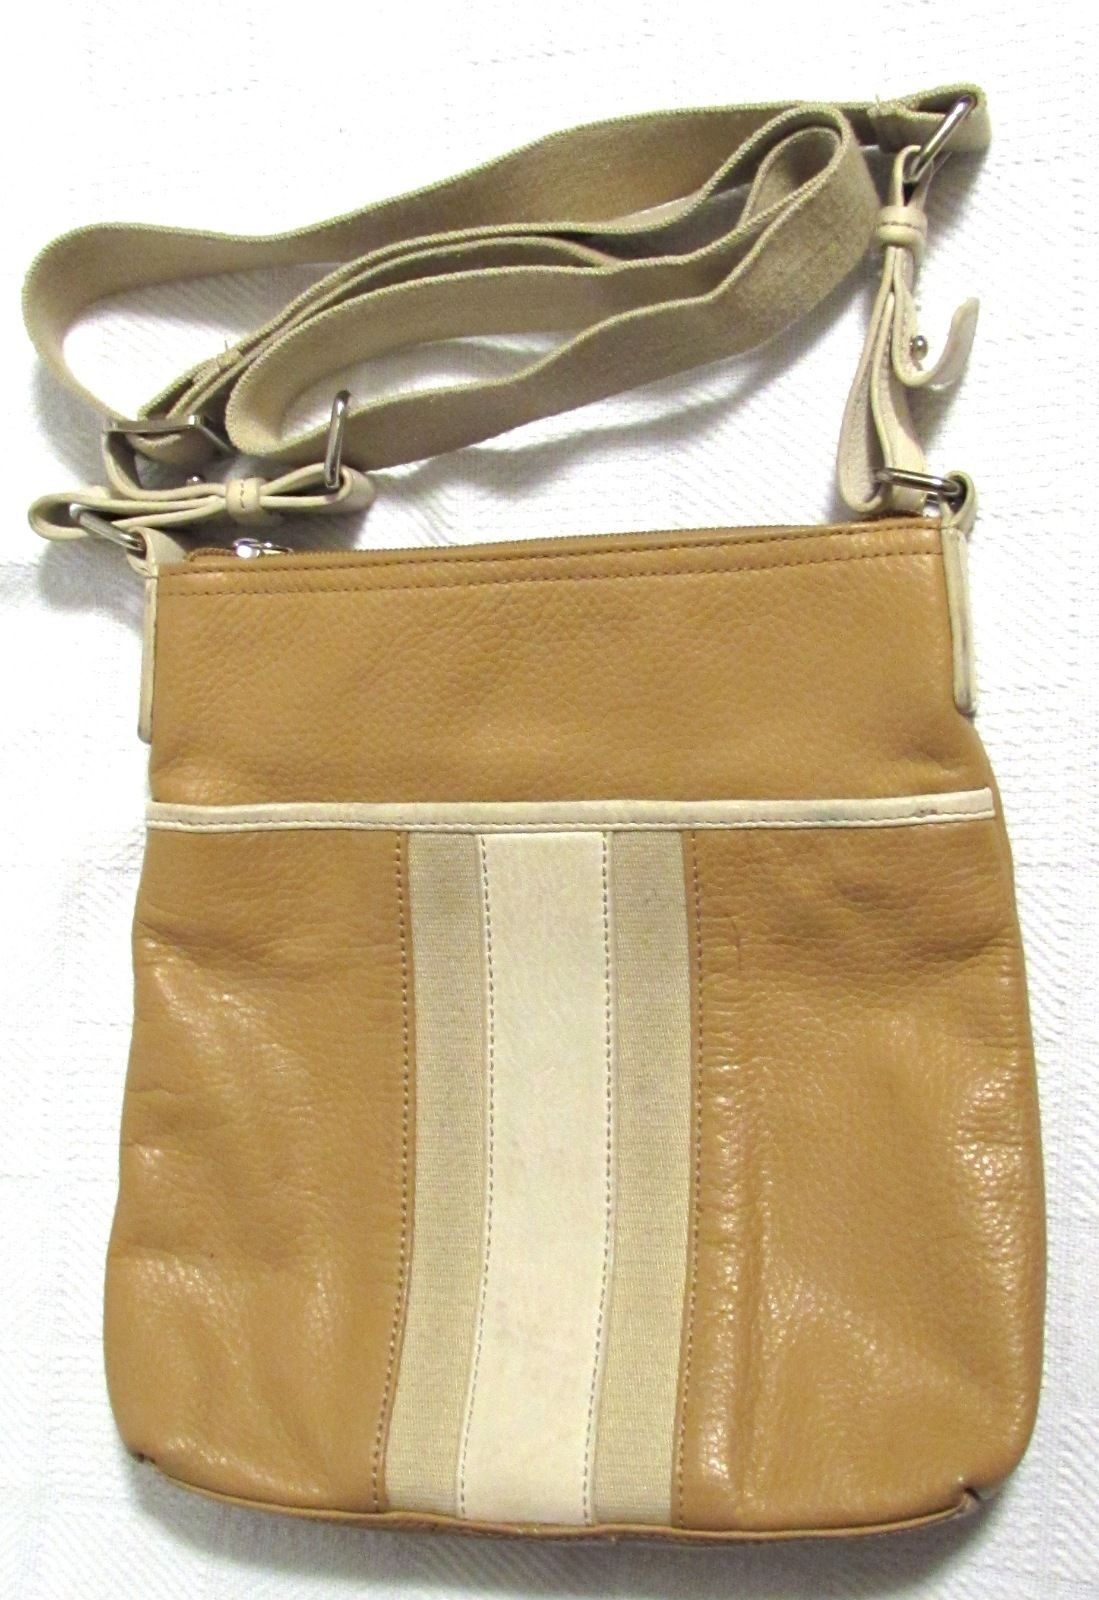 Alfani Women's Leather Beige Stripe Cross-Body/Messenger Handbag